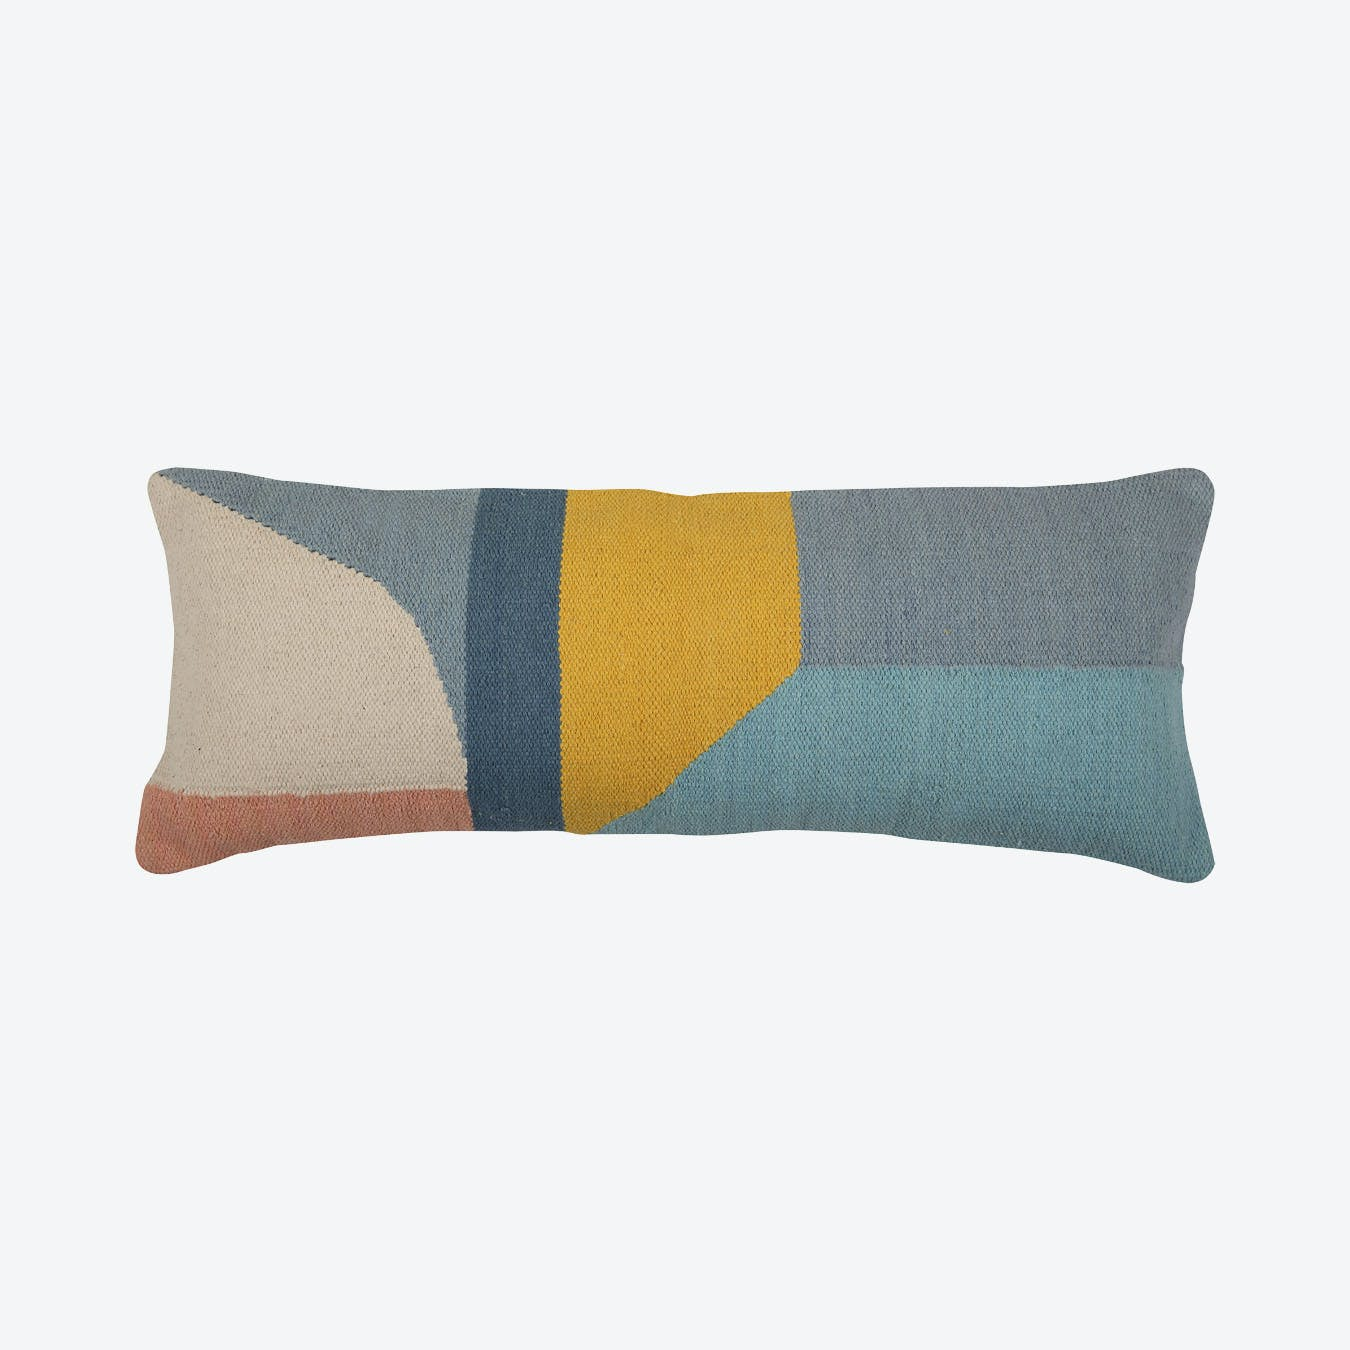 off. Handmade throw pillow cover